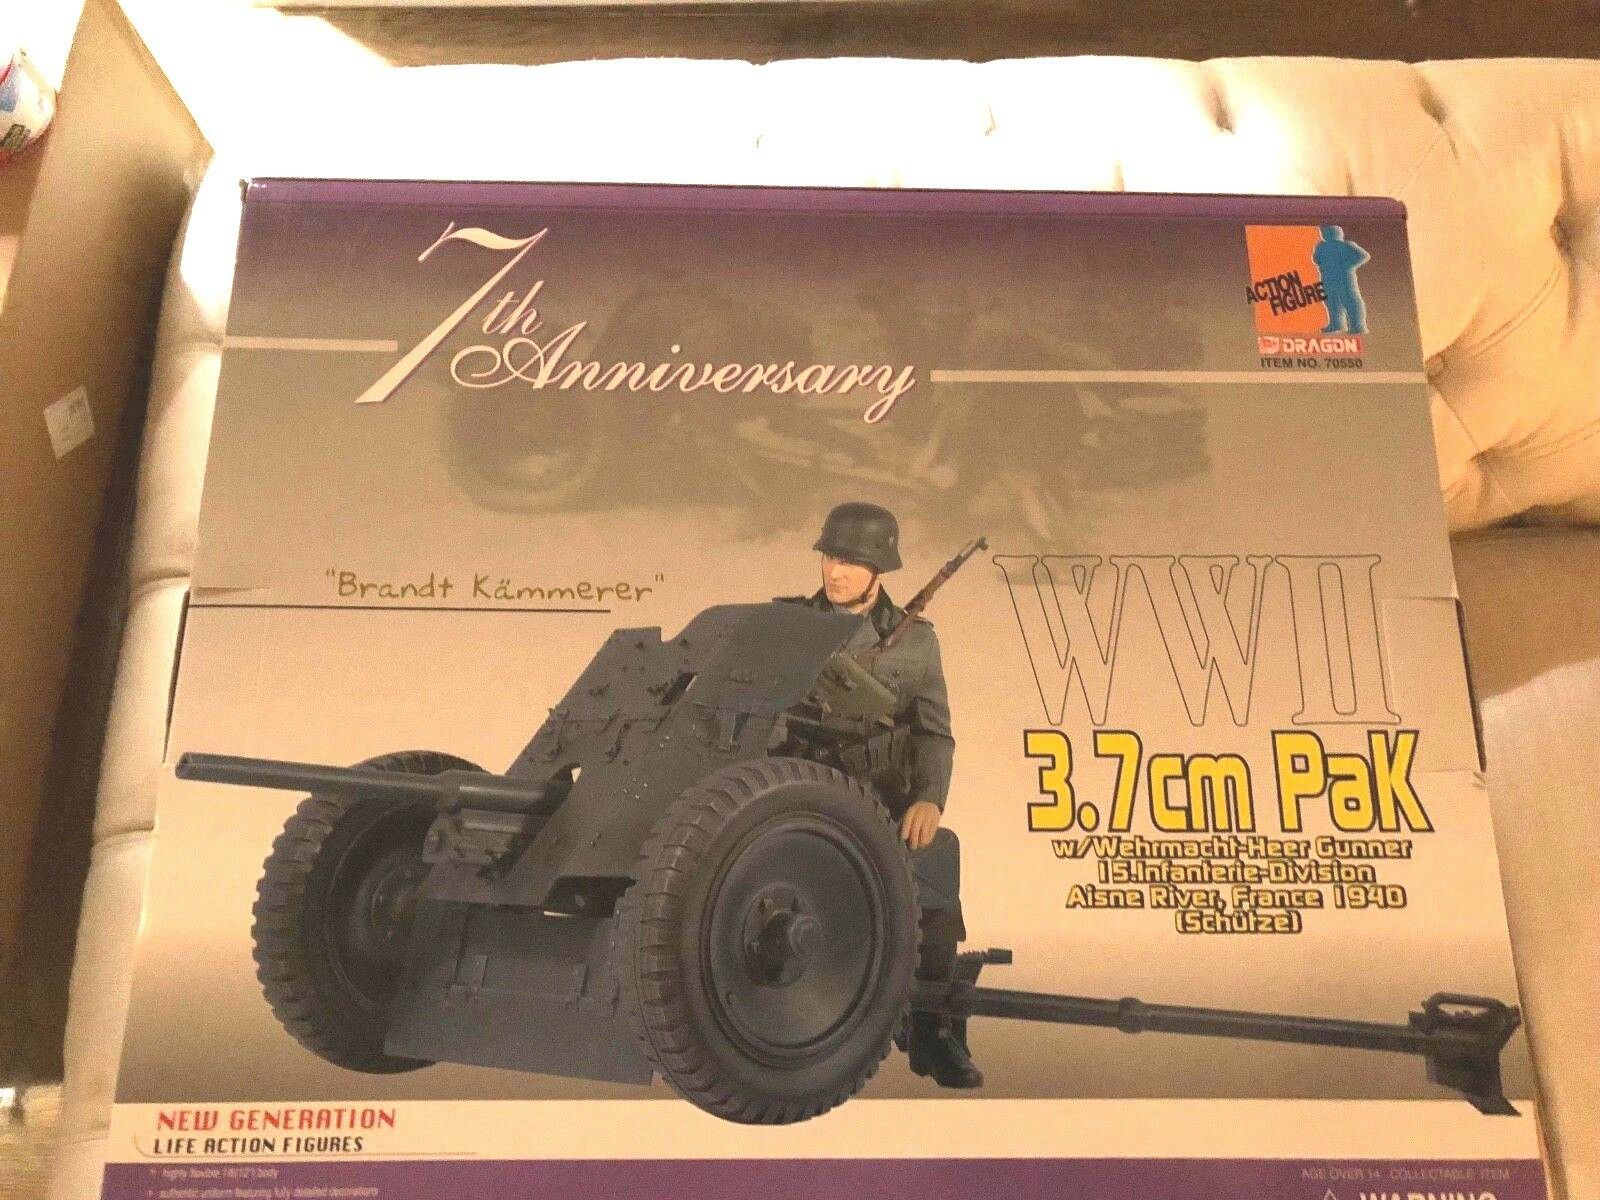 Dragon WWII 1 6 7th Anniversary 3.7cm  PAK  Bret Kammerer   France 1940  promozioni eccitanti